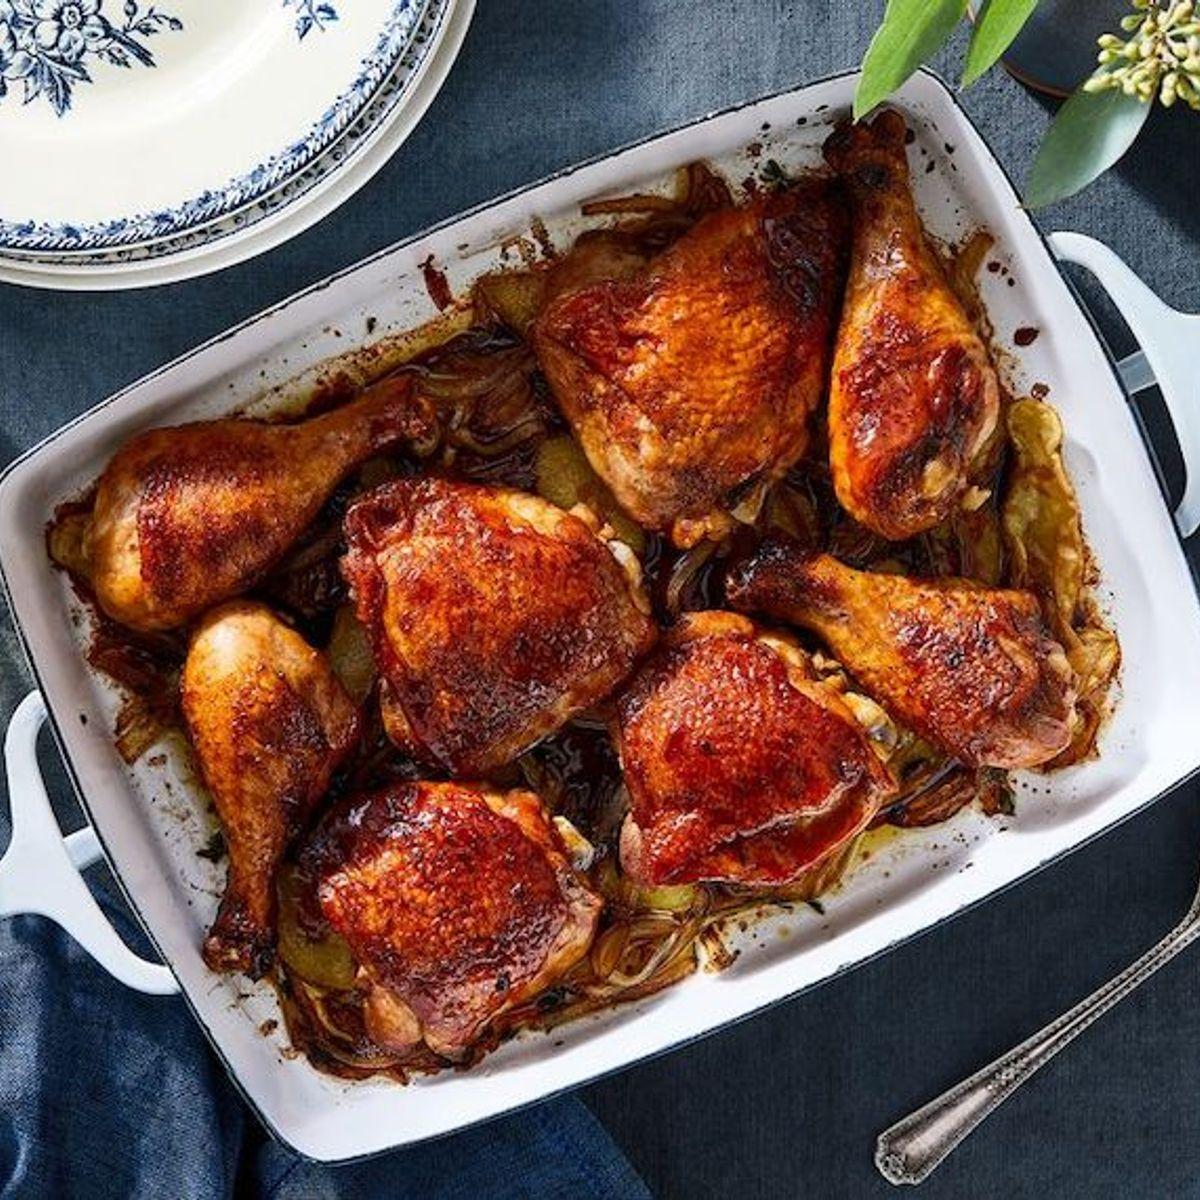 This British pantry staple reinvented my weeknight chicken